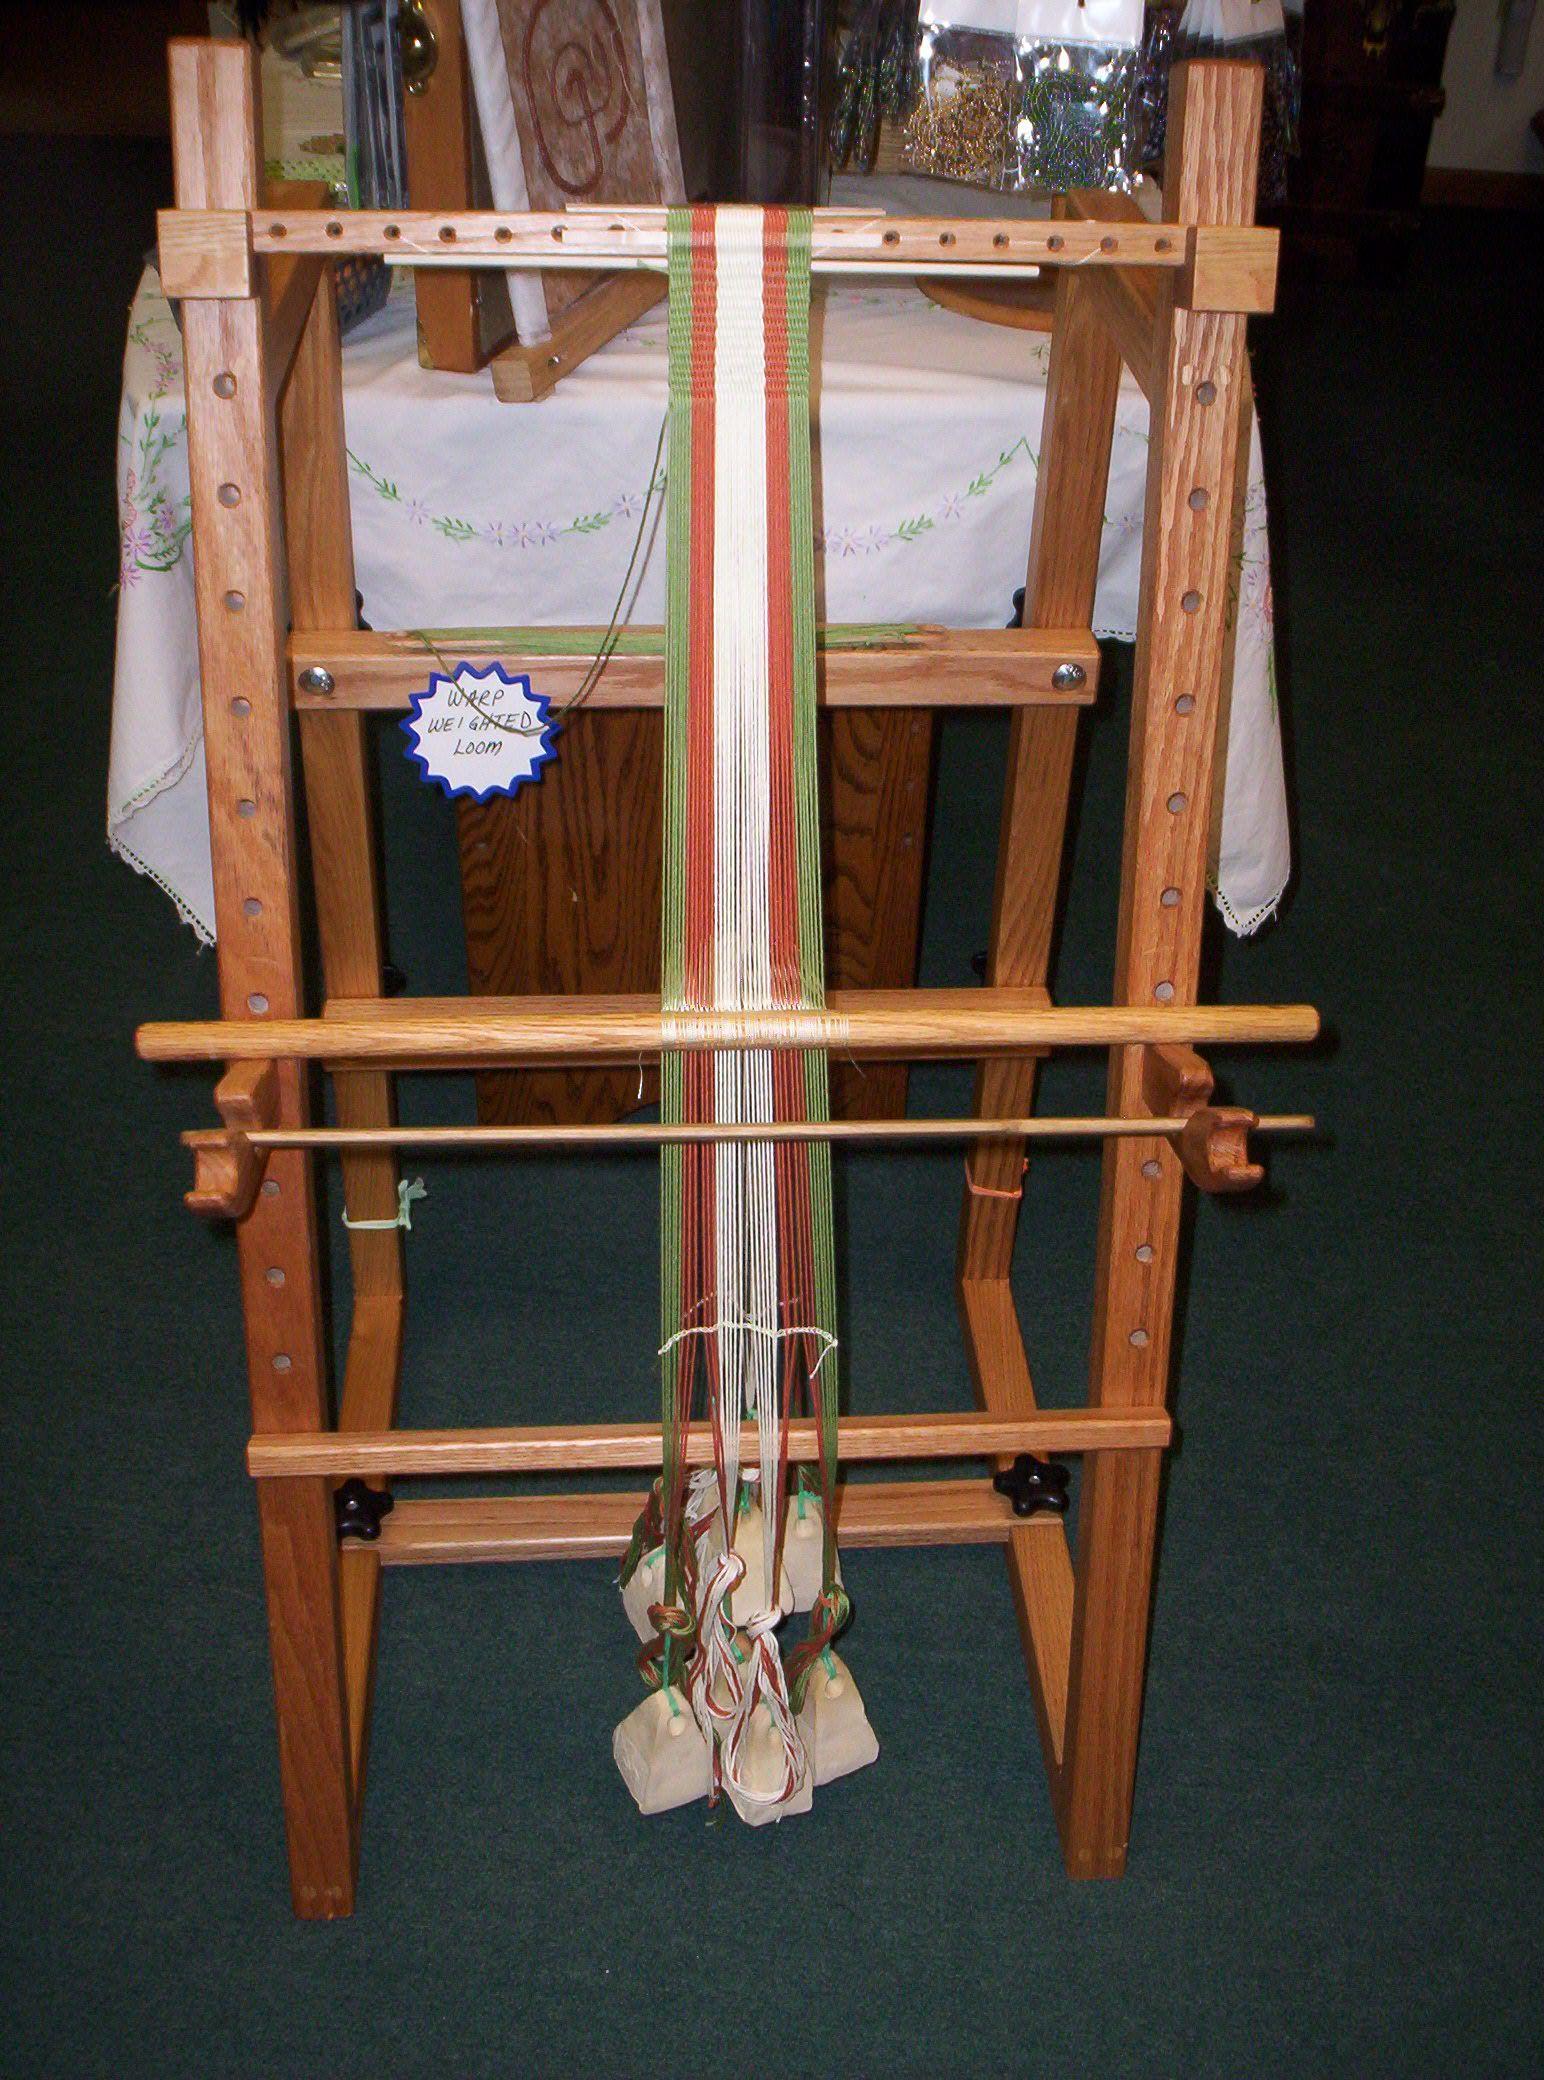 Ceramic loom weights, anyone? http://www.reannagteine.com/Products/FiberTools.html